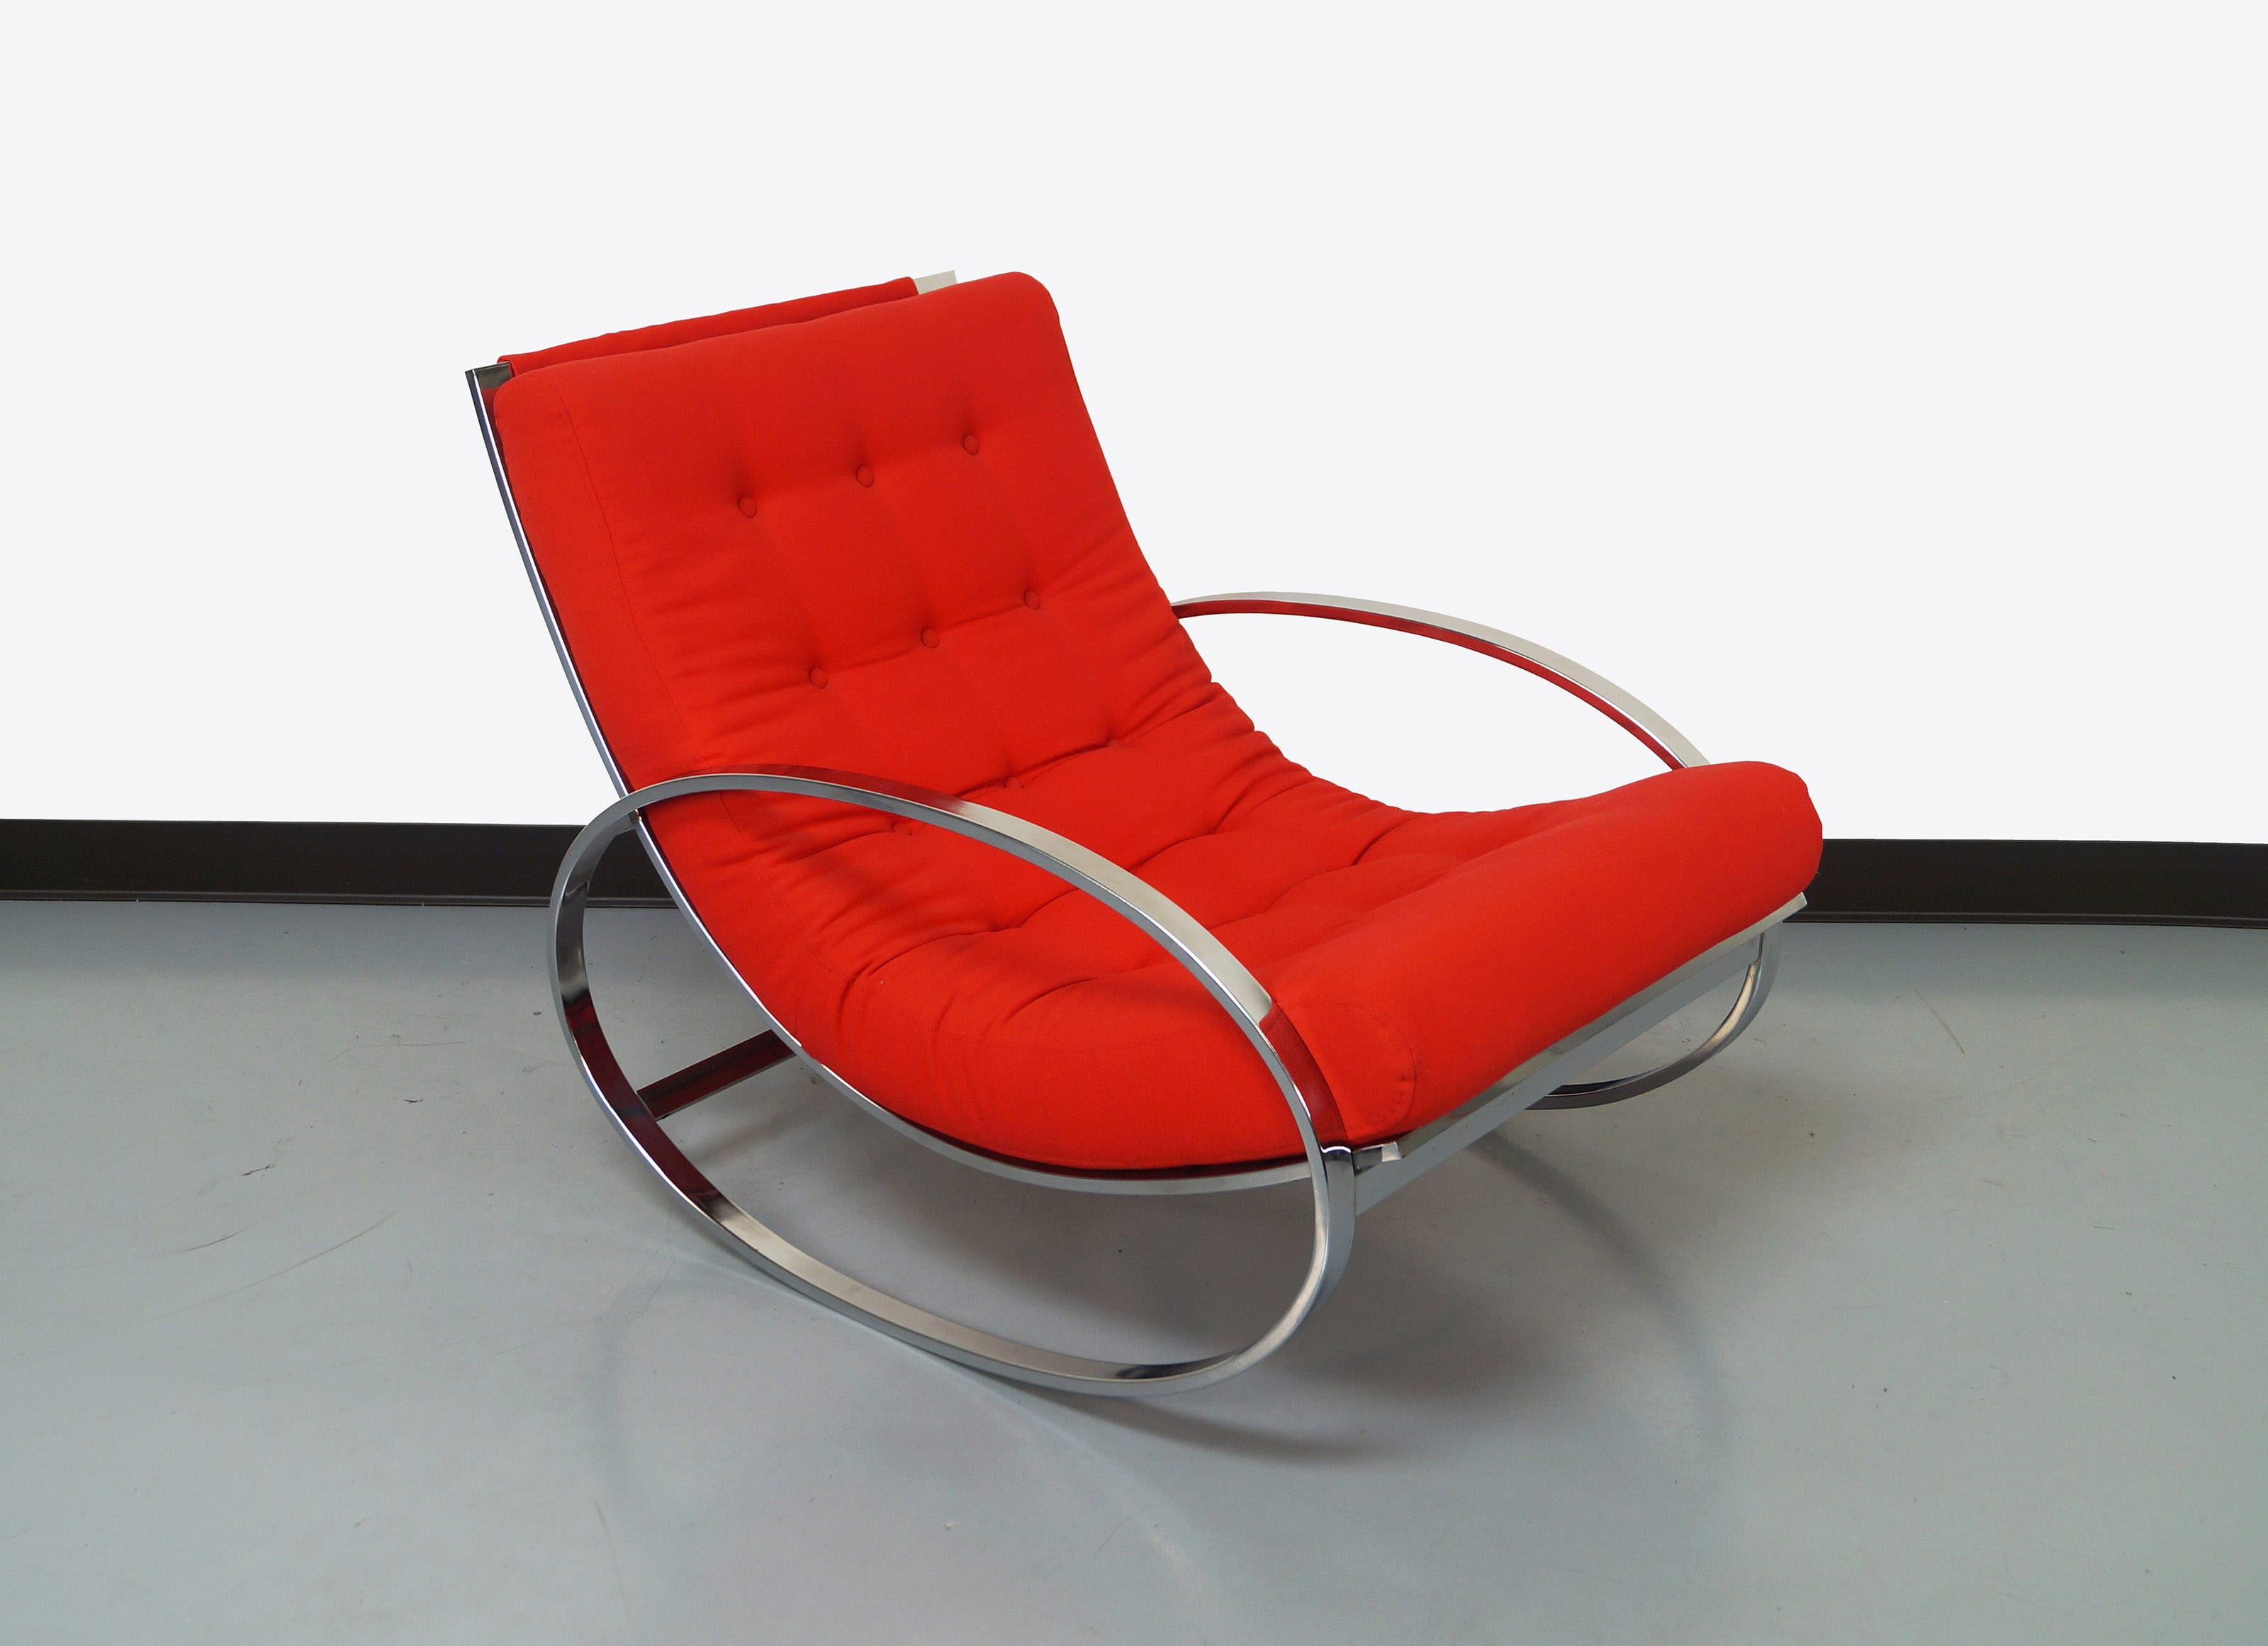 Vintage Chrome Rocking Chair by Renato Zevi